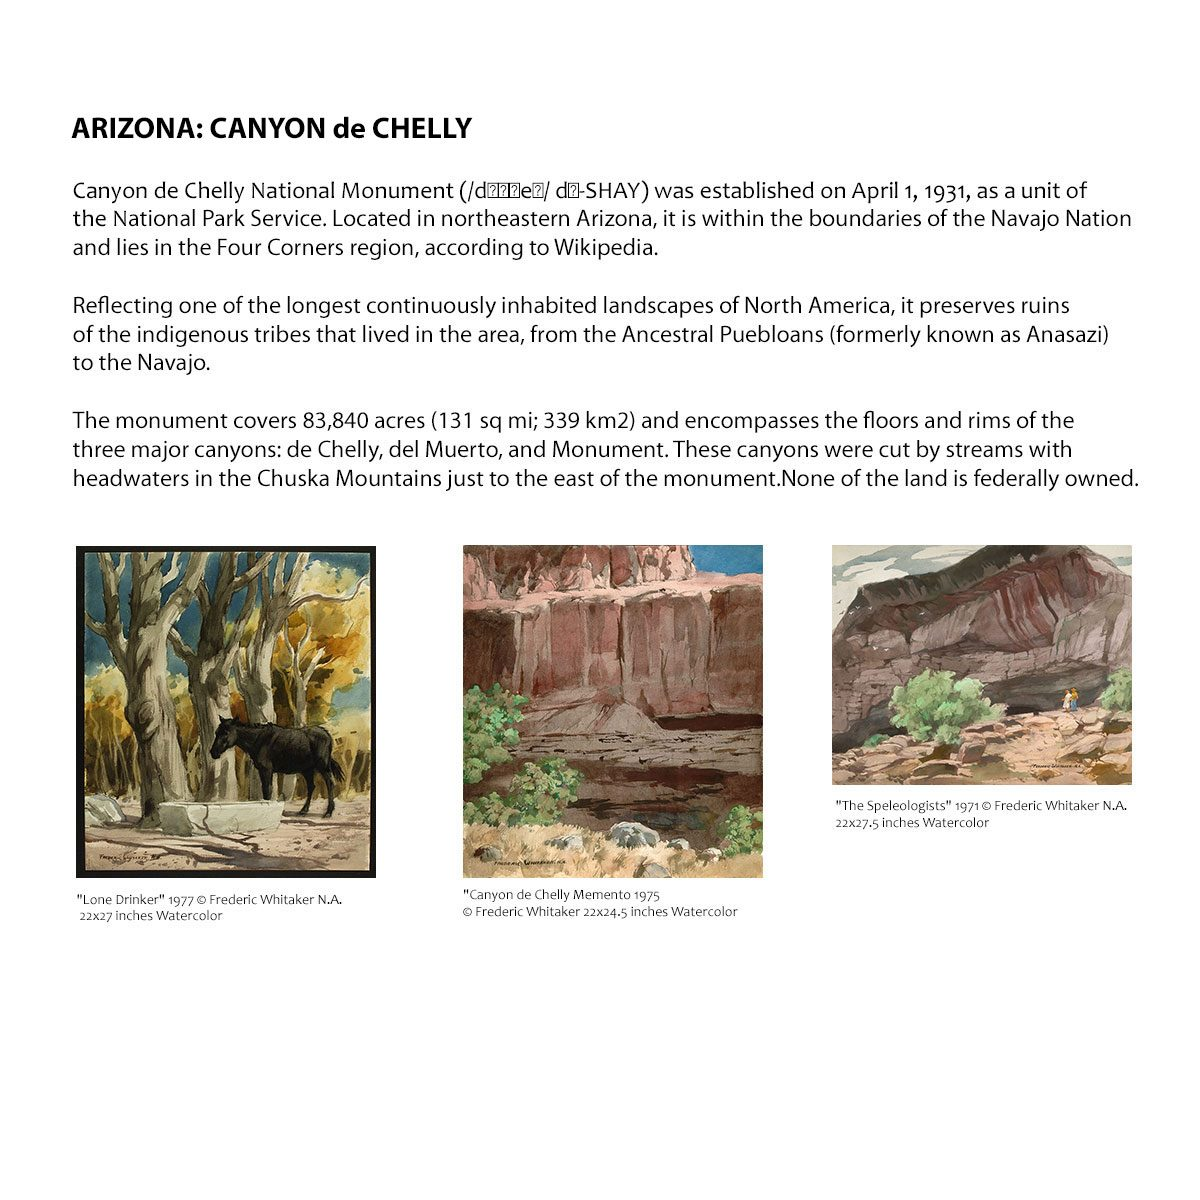 Arizona: Canyon de Chelly